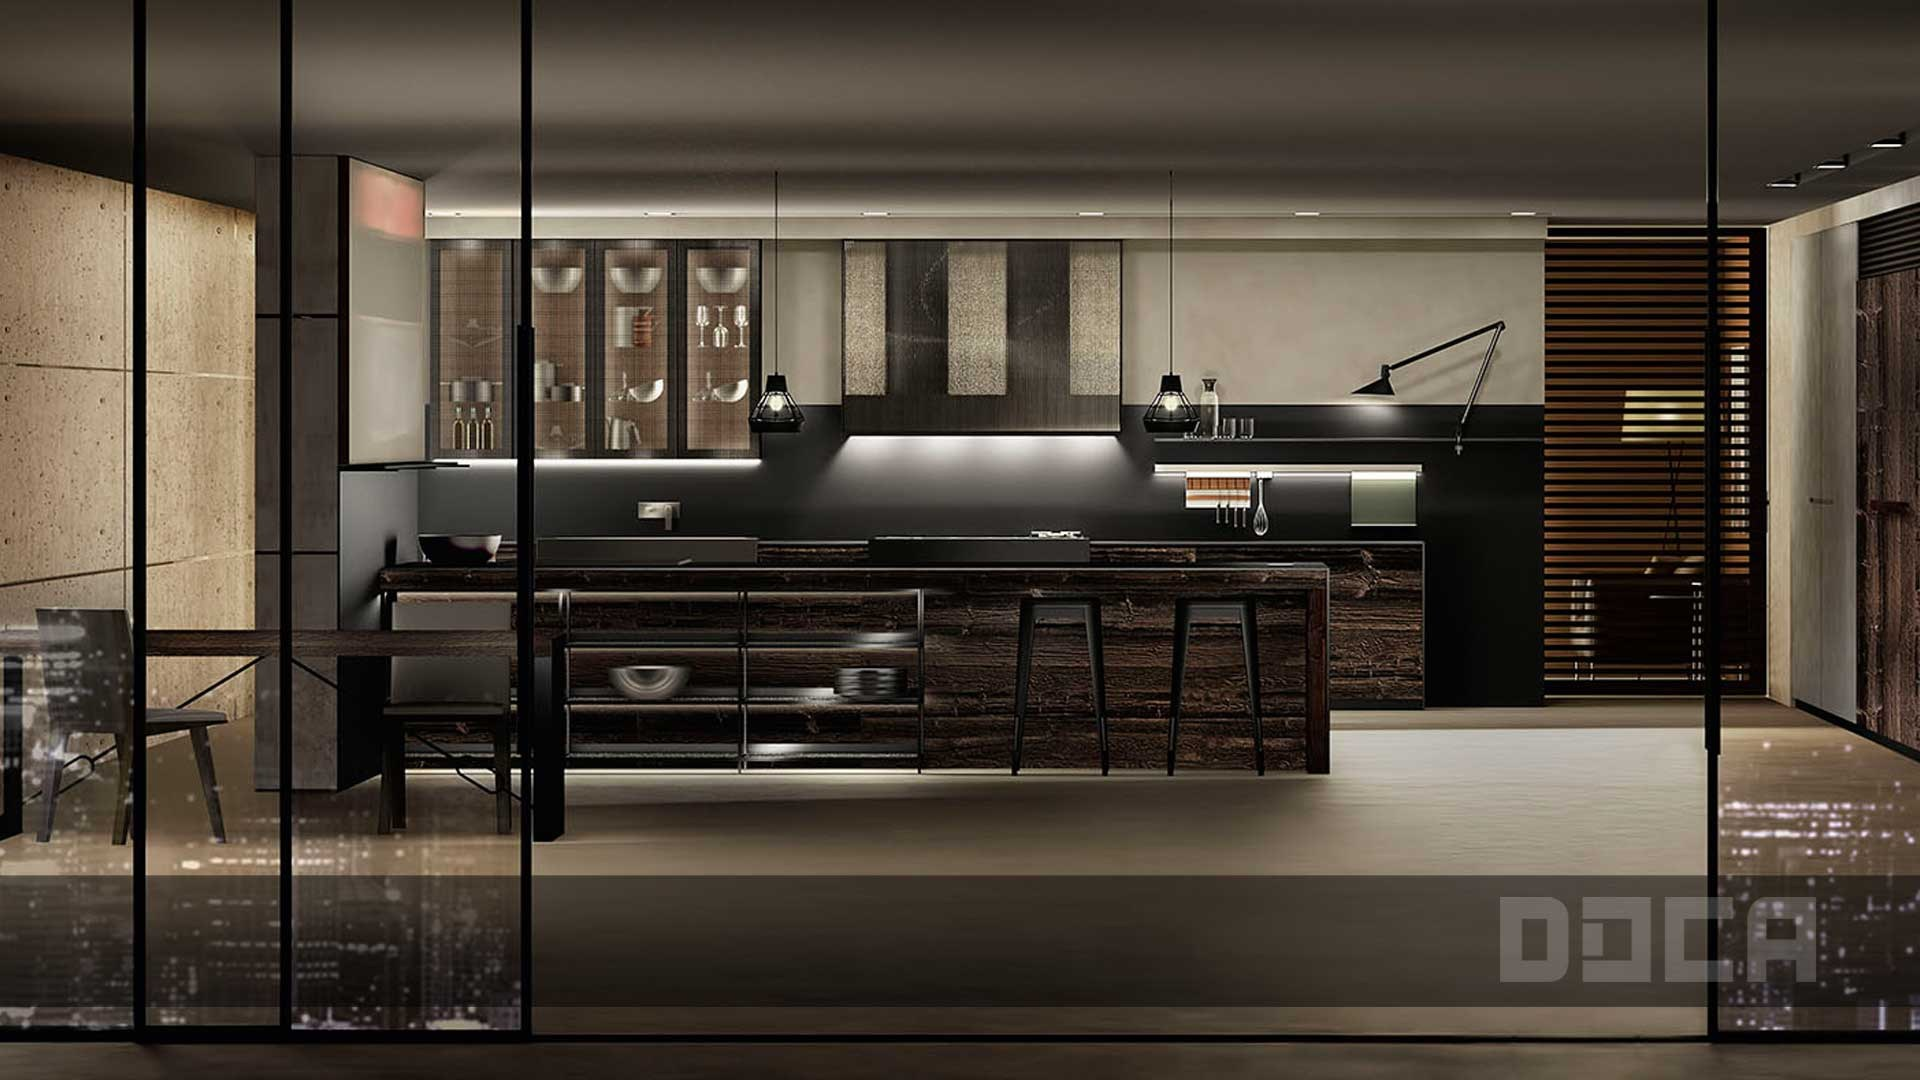 Cucina legno di recupero : cucina con legno di recupero. cucina ...